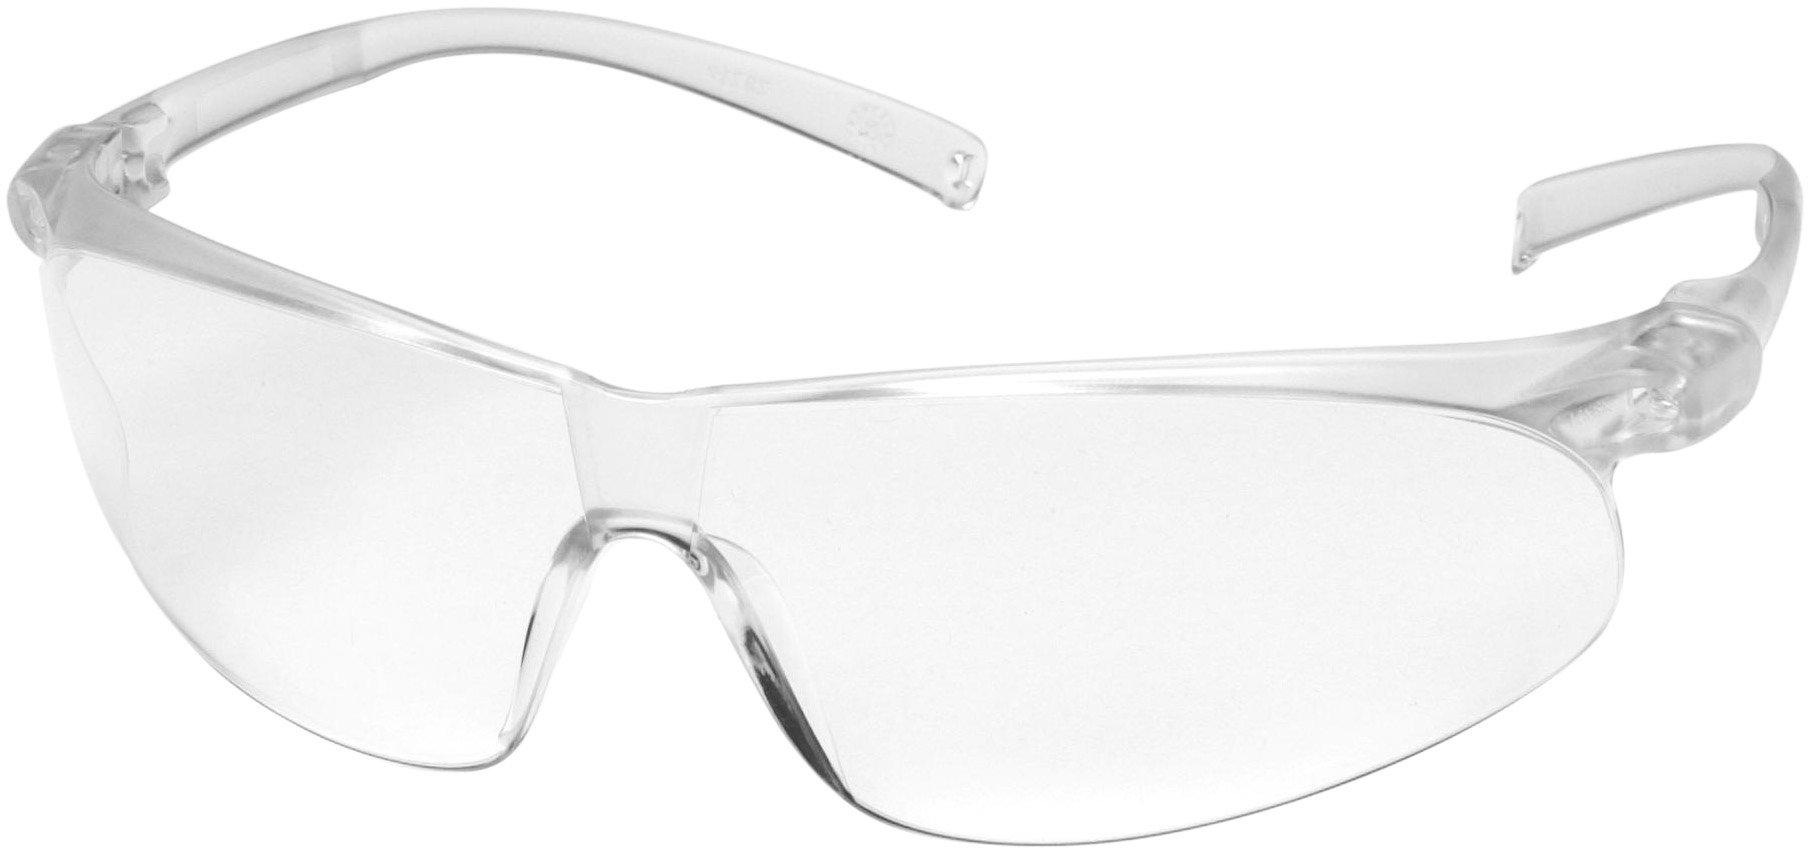 3M AO Safety/3M Tekk 11384 Virtua Sport Anti-Fog Safety Glasses, Clear Frame, Clear Lens